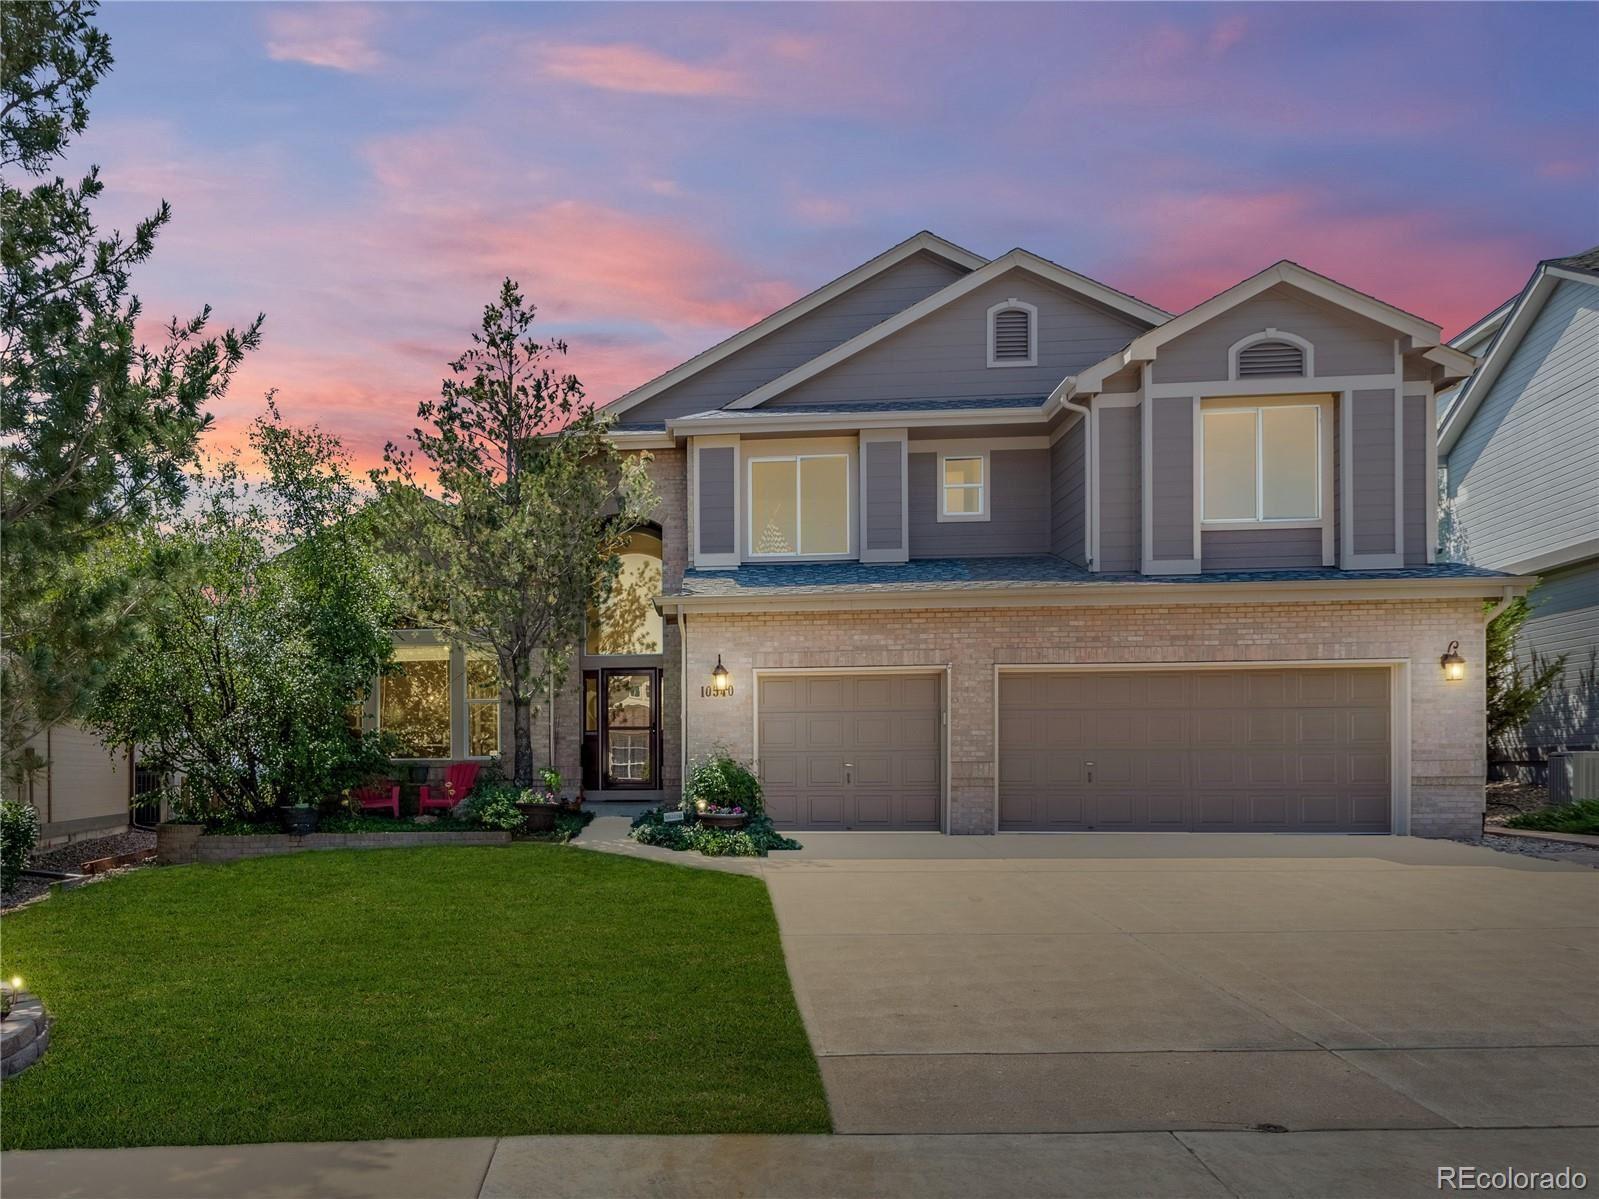 10540 W Vassar Drive, Lakewood, CO 80227 - MLS#: 9489748